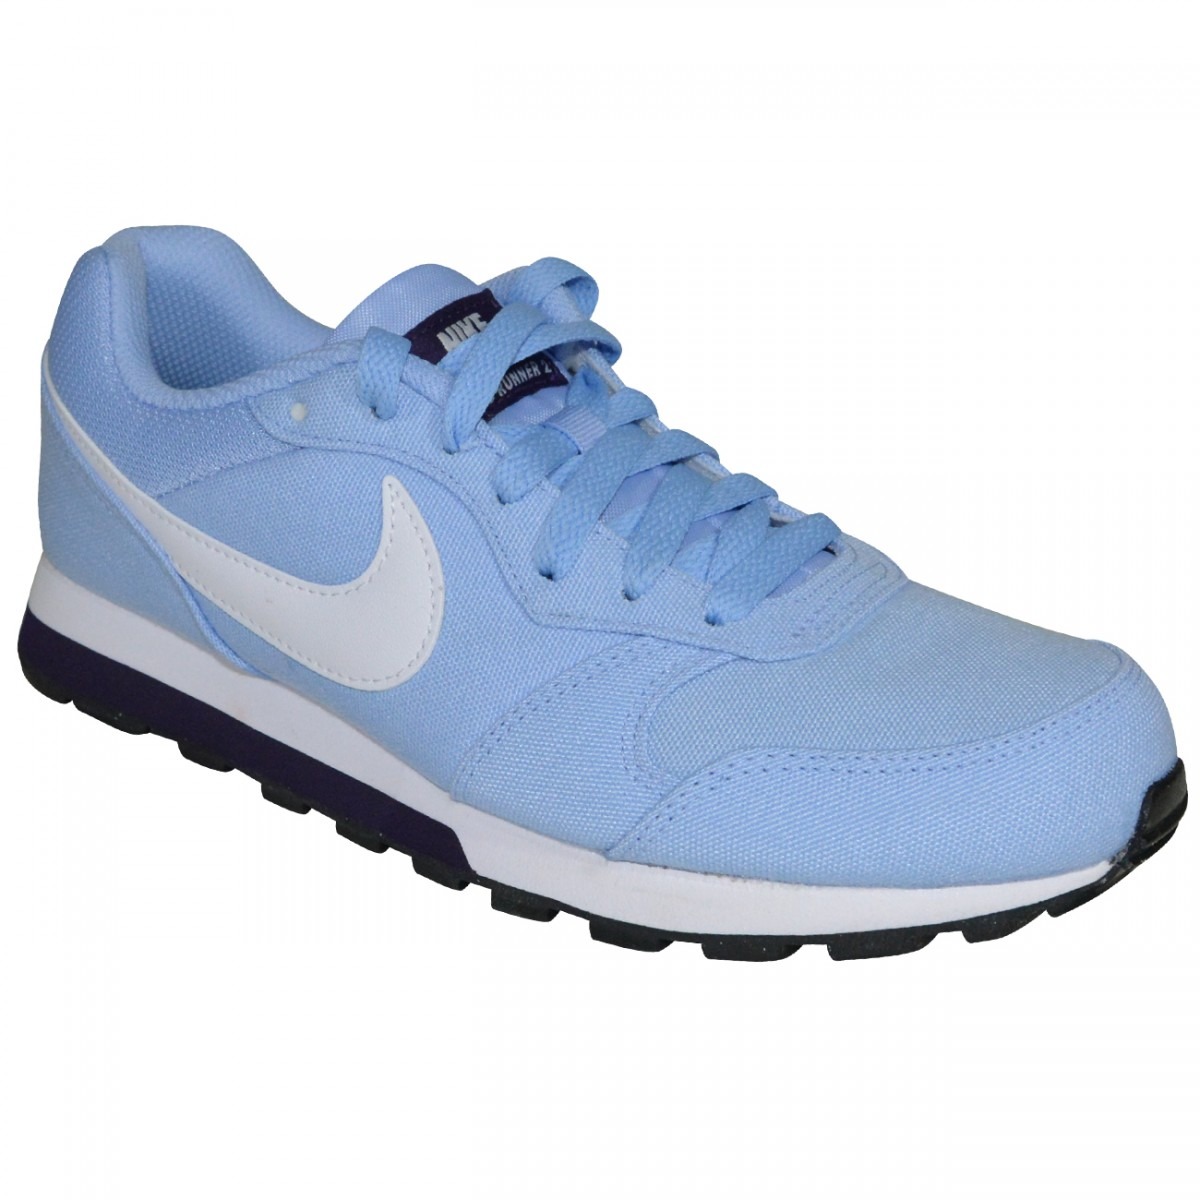 08e891fca Tenis Nike MD Runner 2 749869 405 - Azul Bebe Branco - Chuteira Nike ...